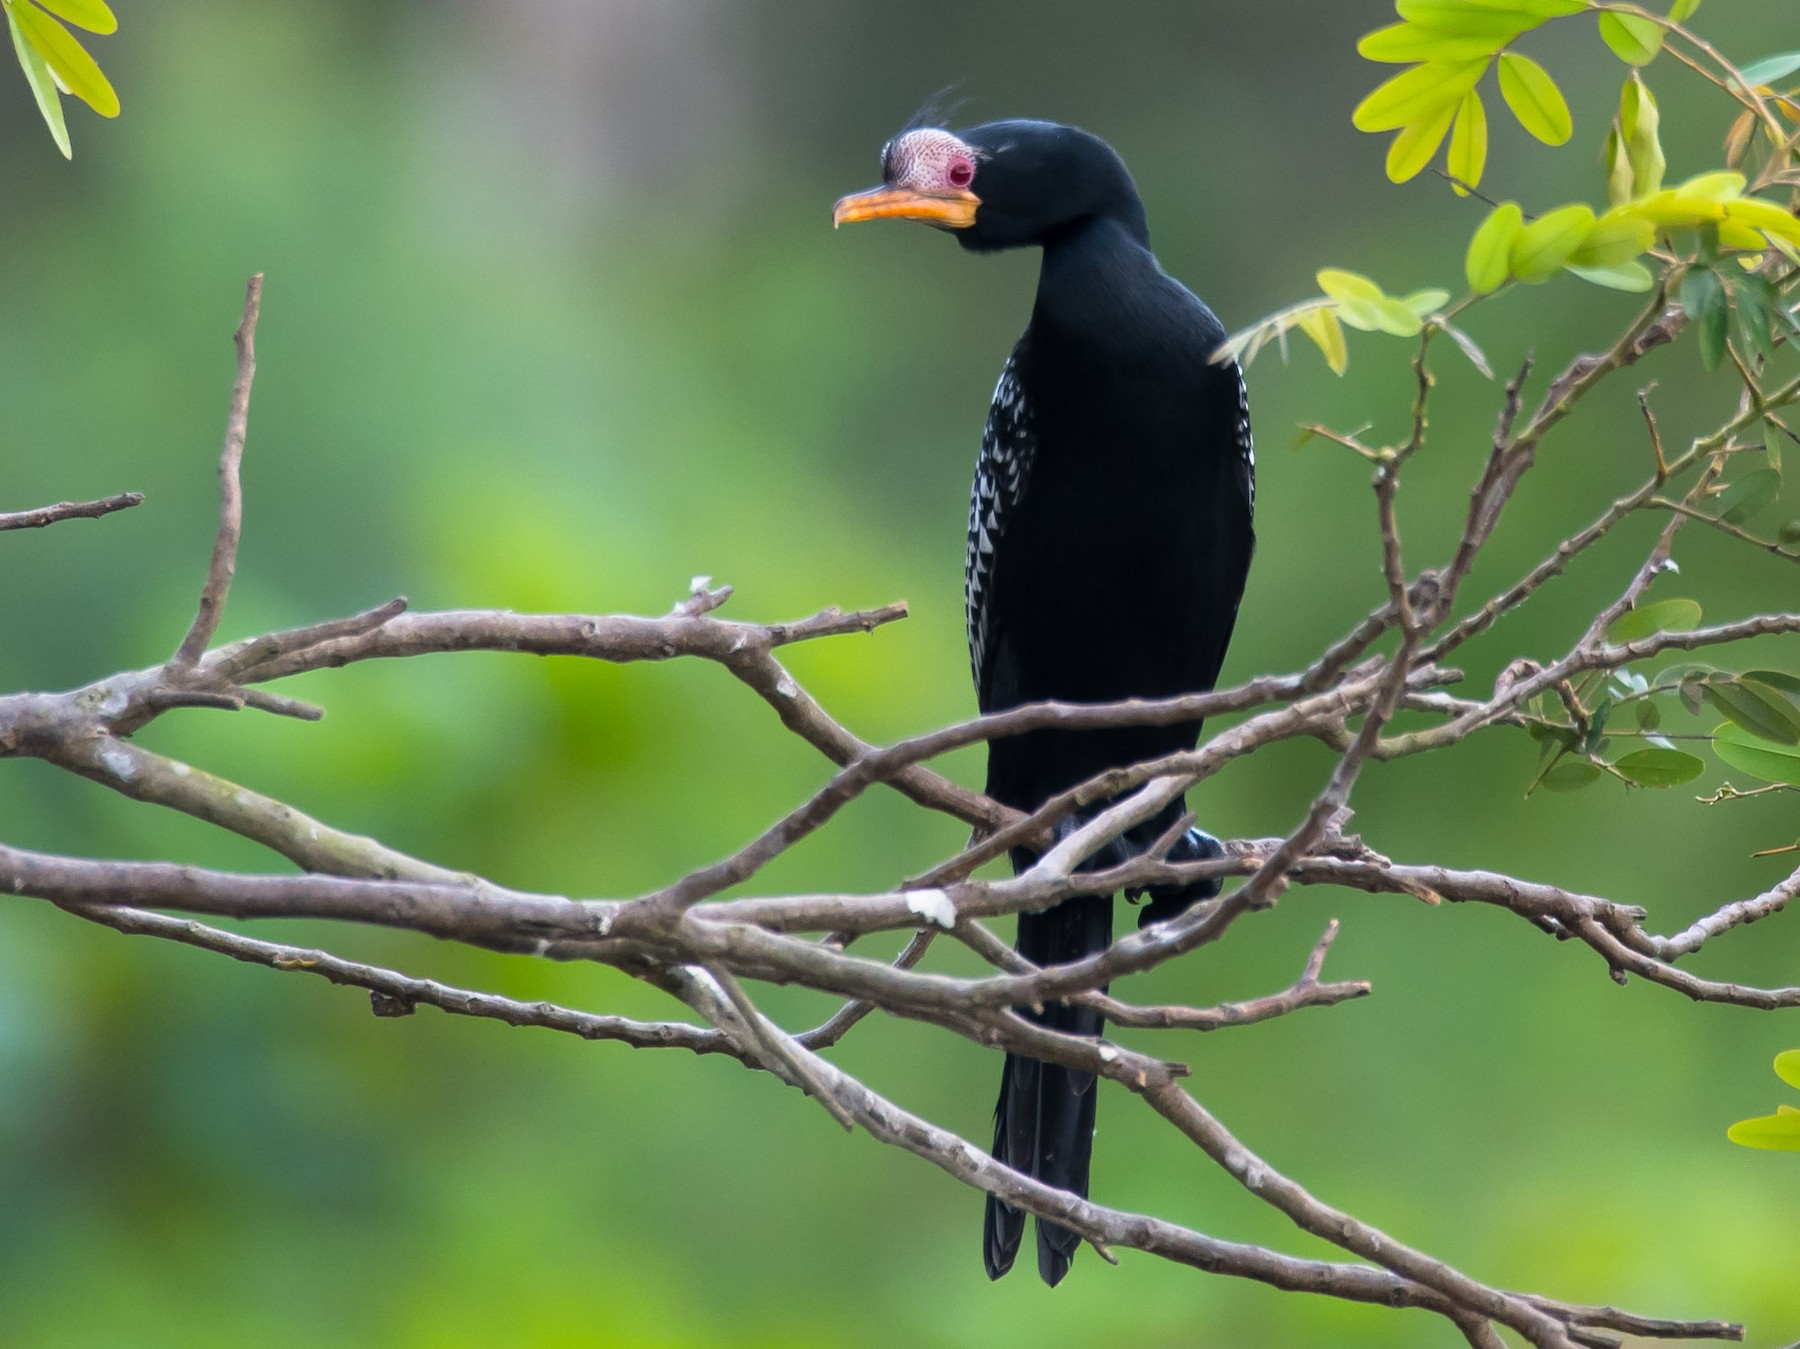 Long-tailed Cormorant - Eric francois Roualet